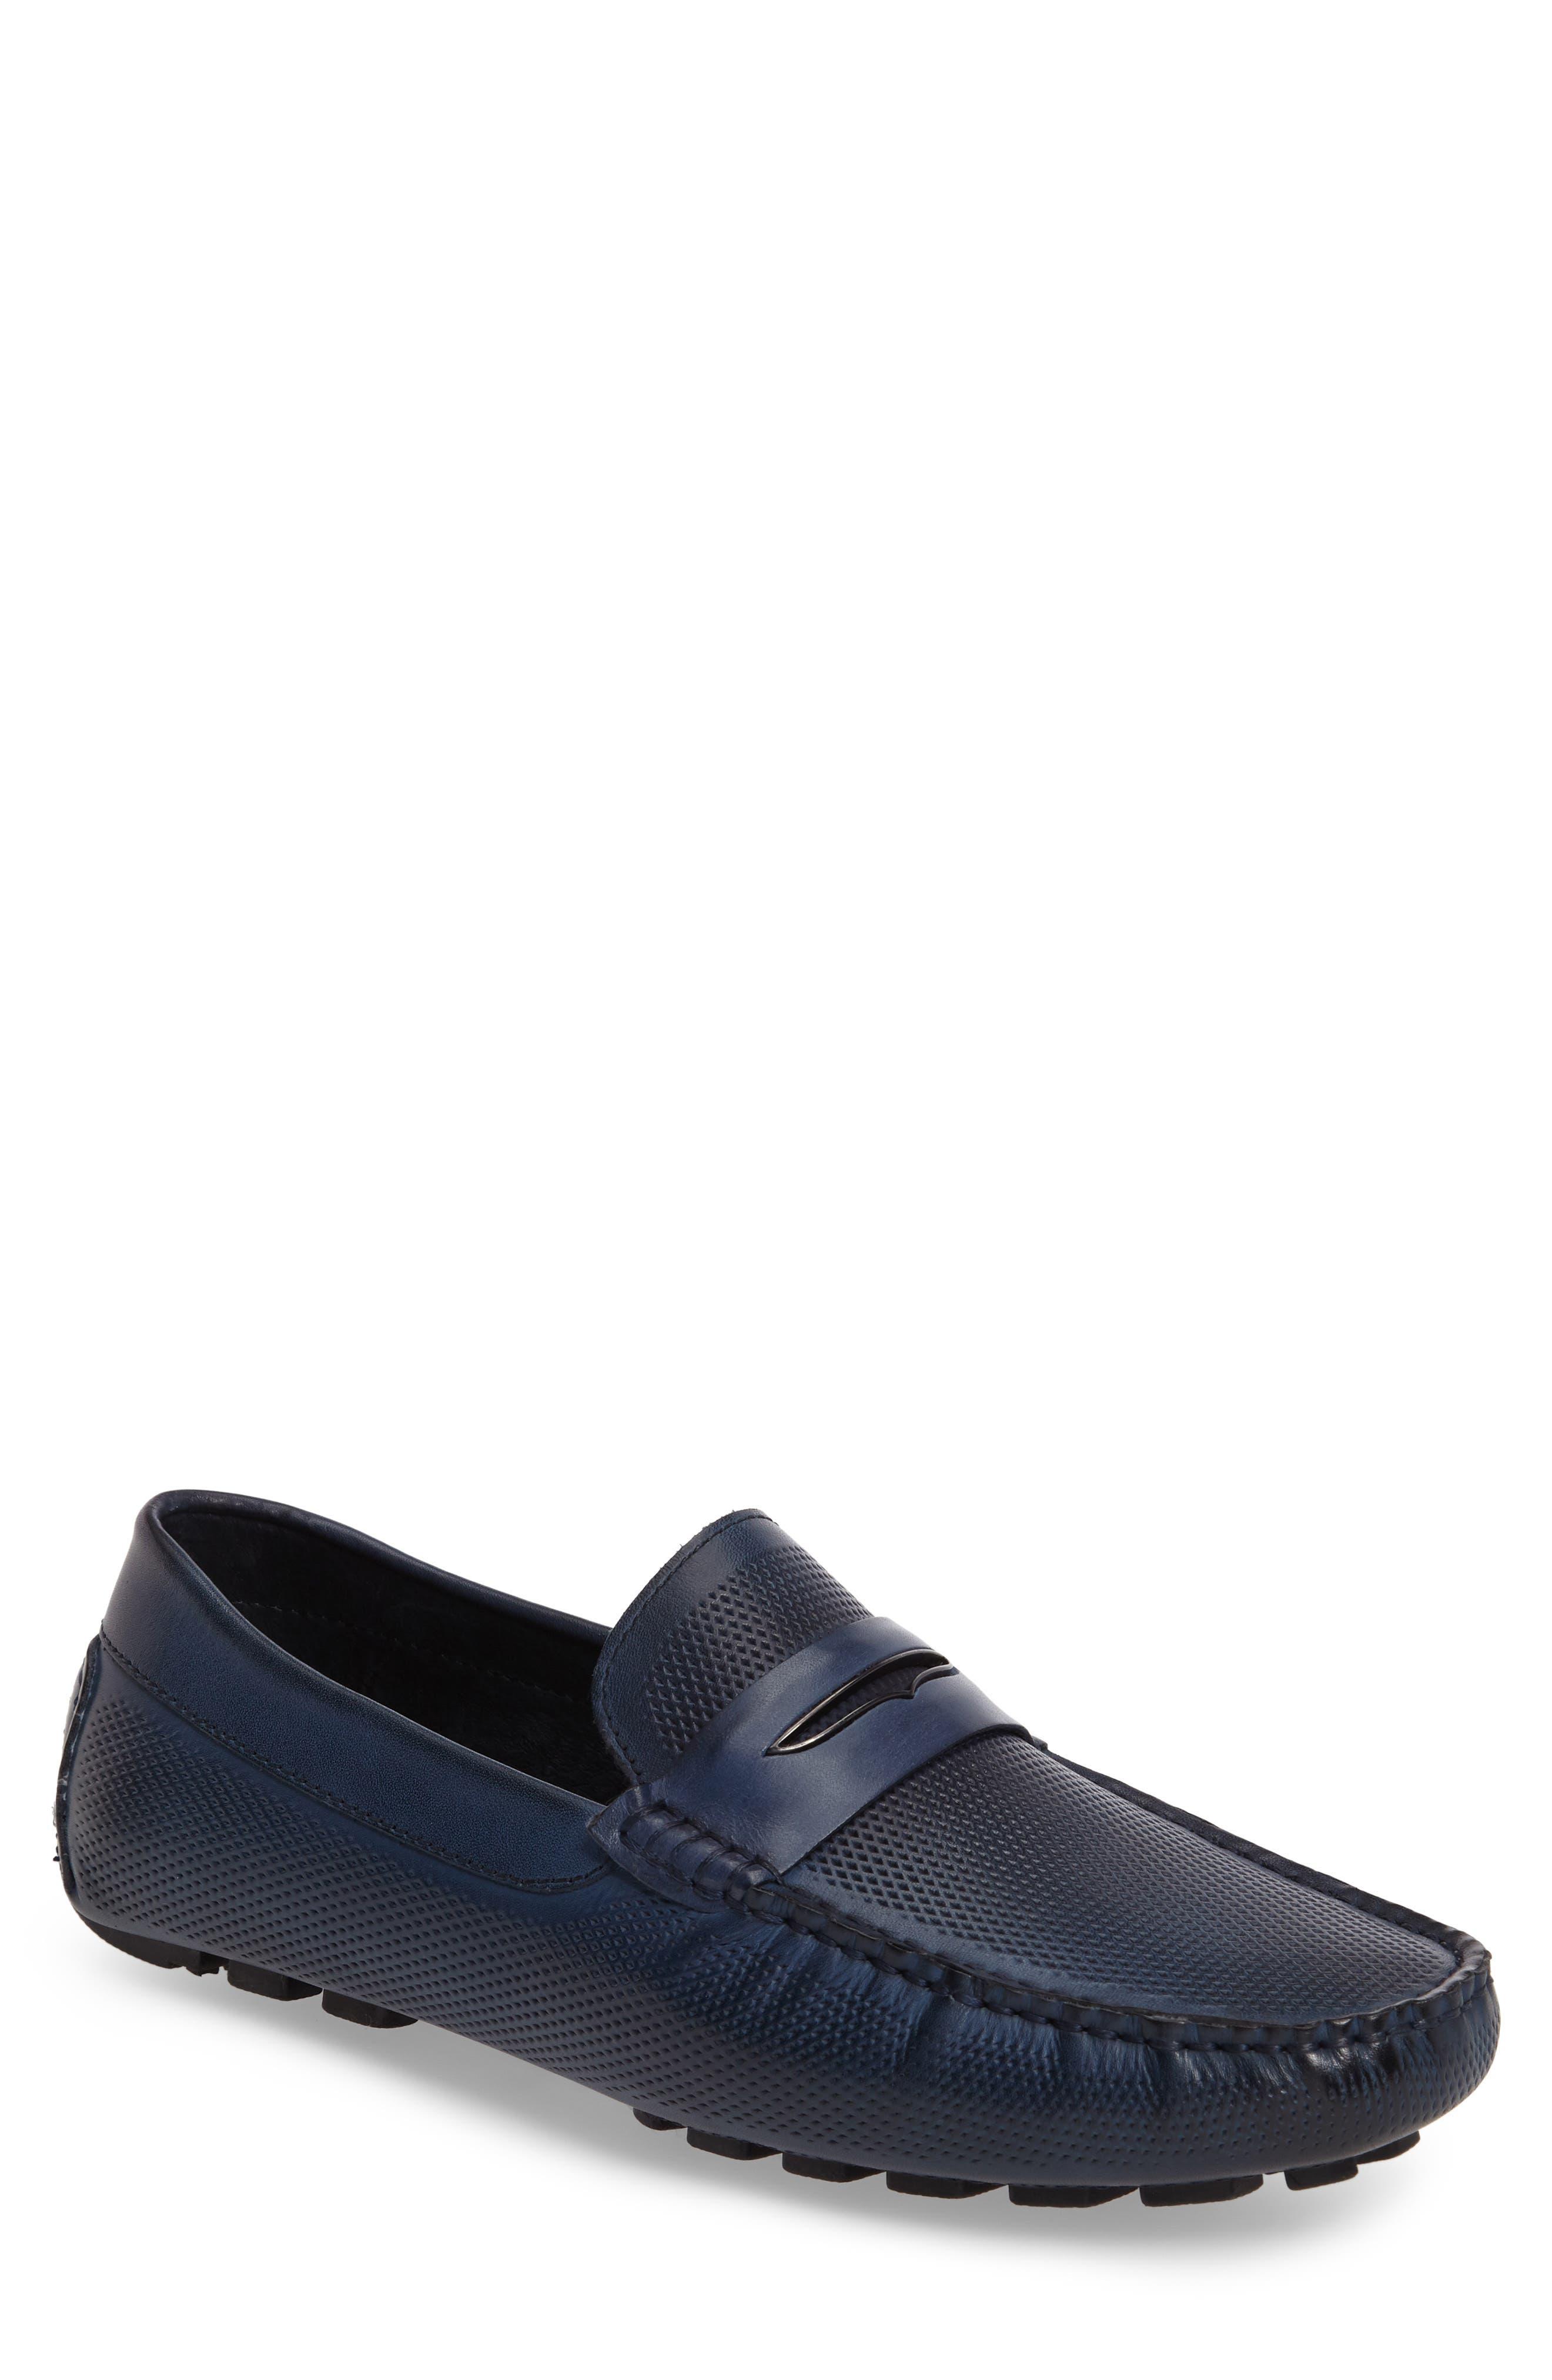 Main Image - Zanzara Mondrian Driving Shoe (Men)